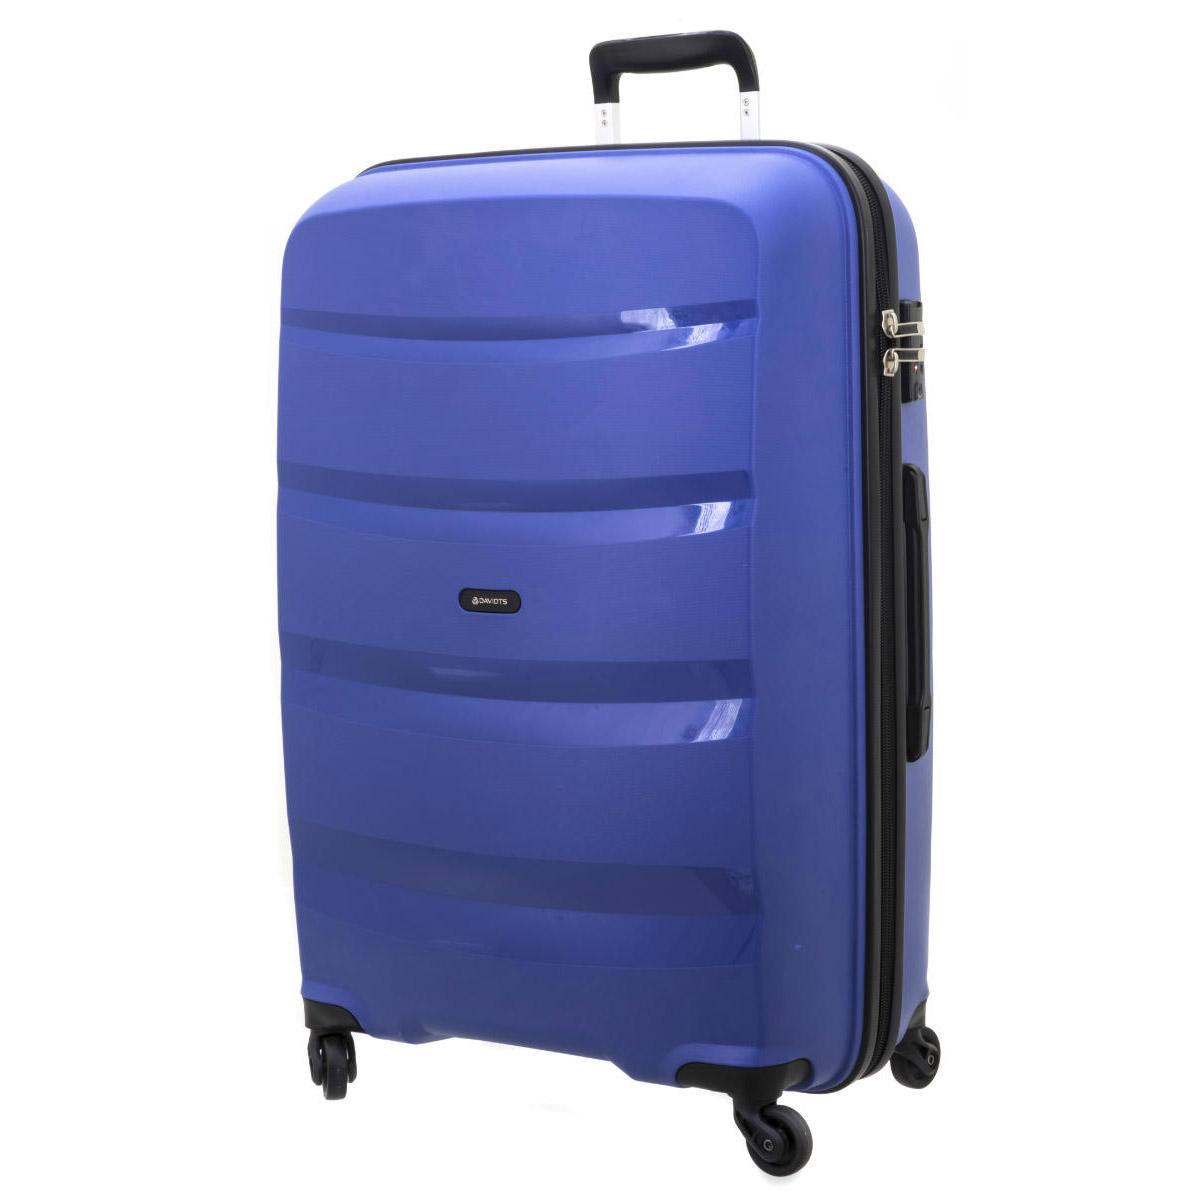 Valise trolley coque polypropylène \'Davidt\'s\' bleu - 74x49x30 cm - [Q3499]